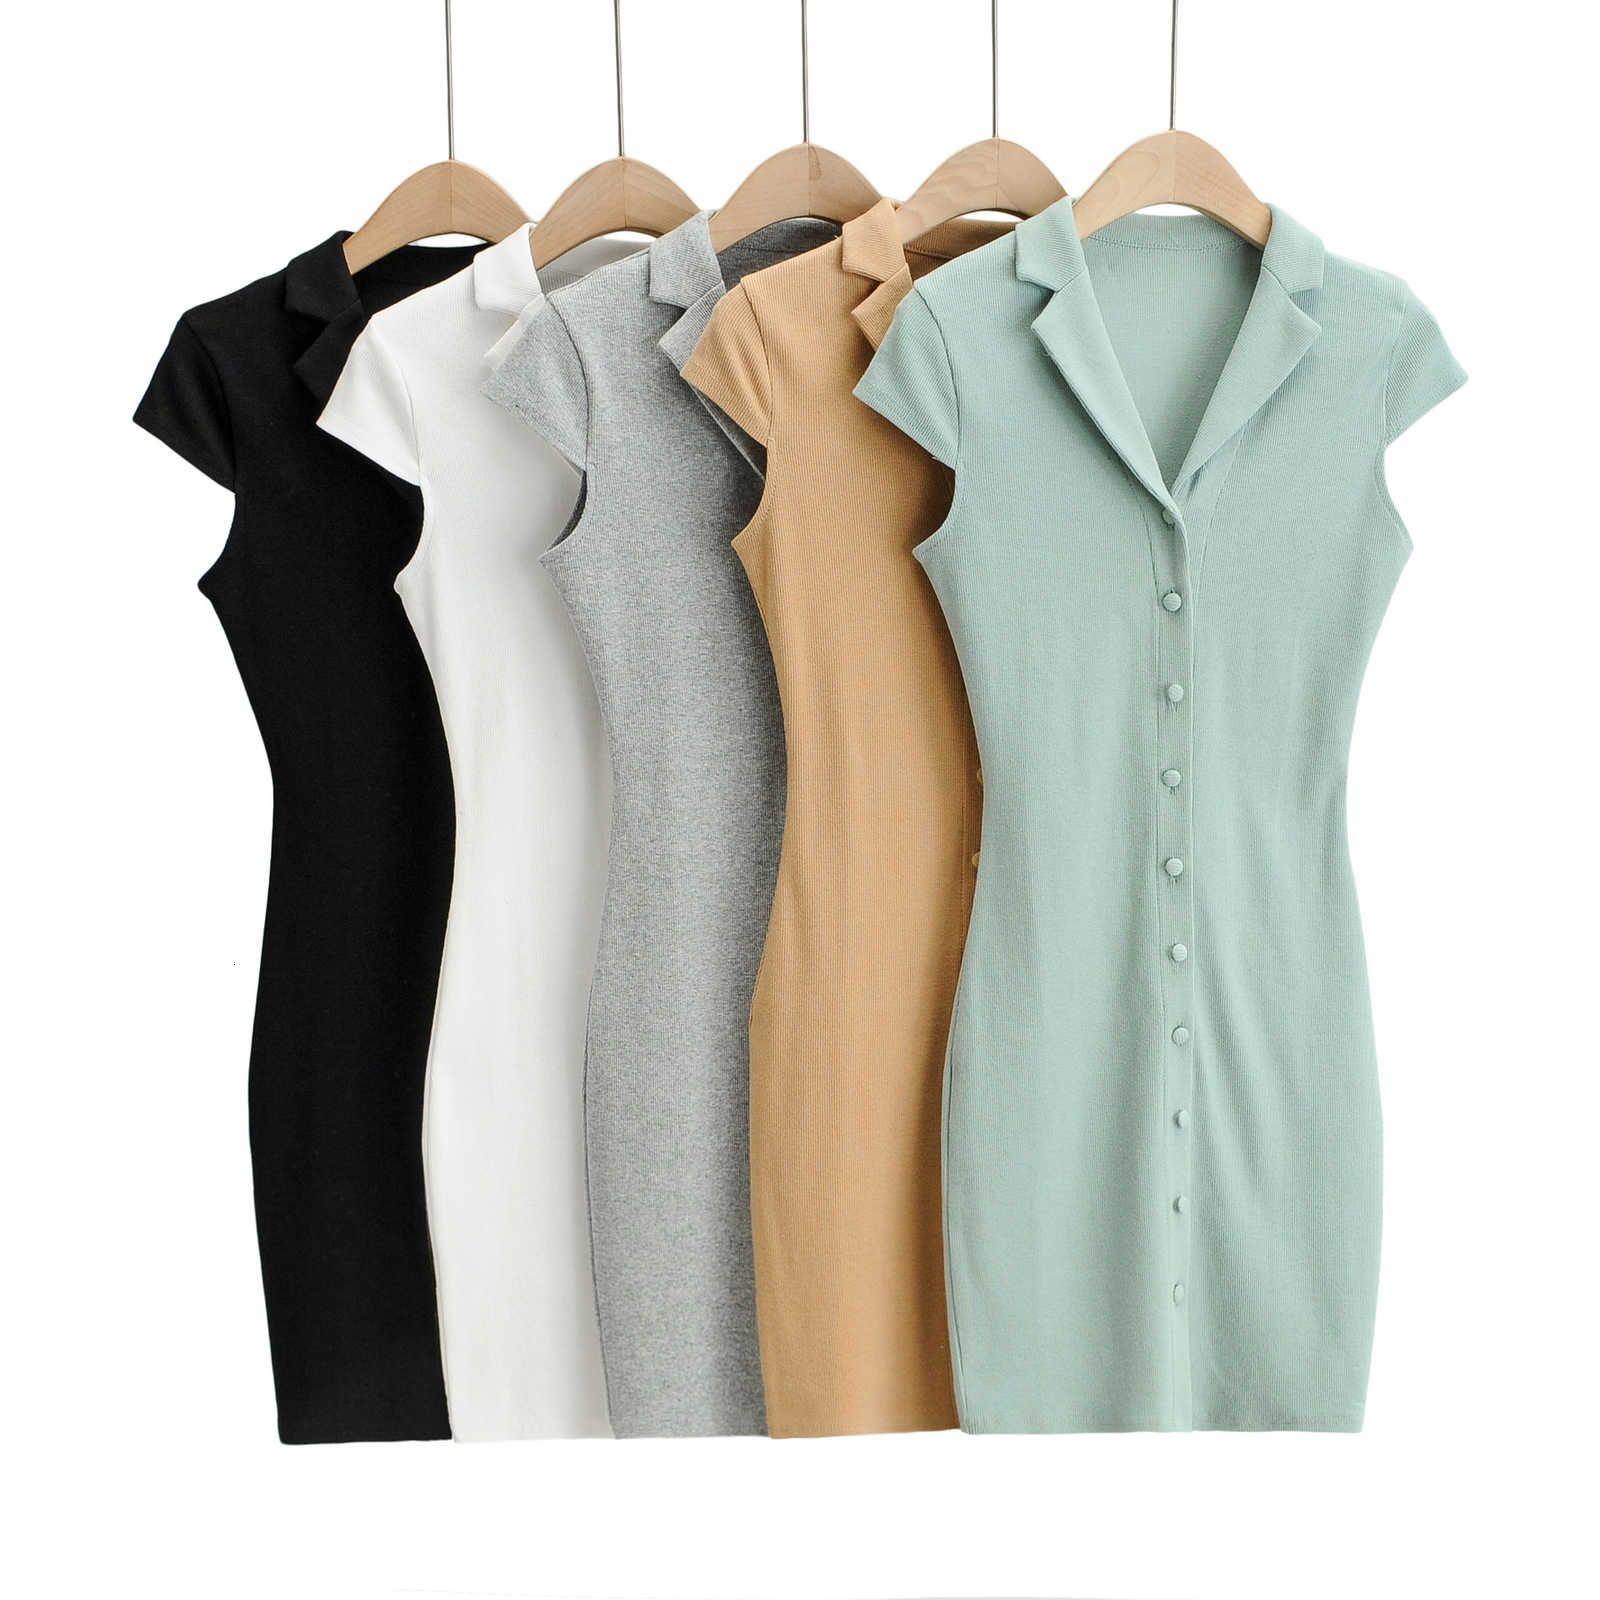 Spring and Summer Femmes enveloppe d'épaule épaule à manches courtes à manches courtes minces jupe boutonnées coton